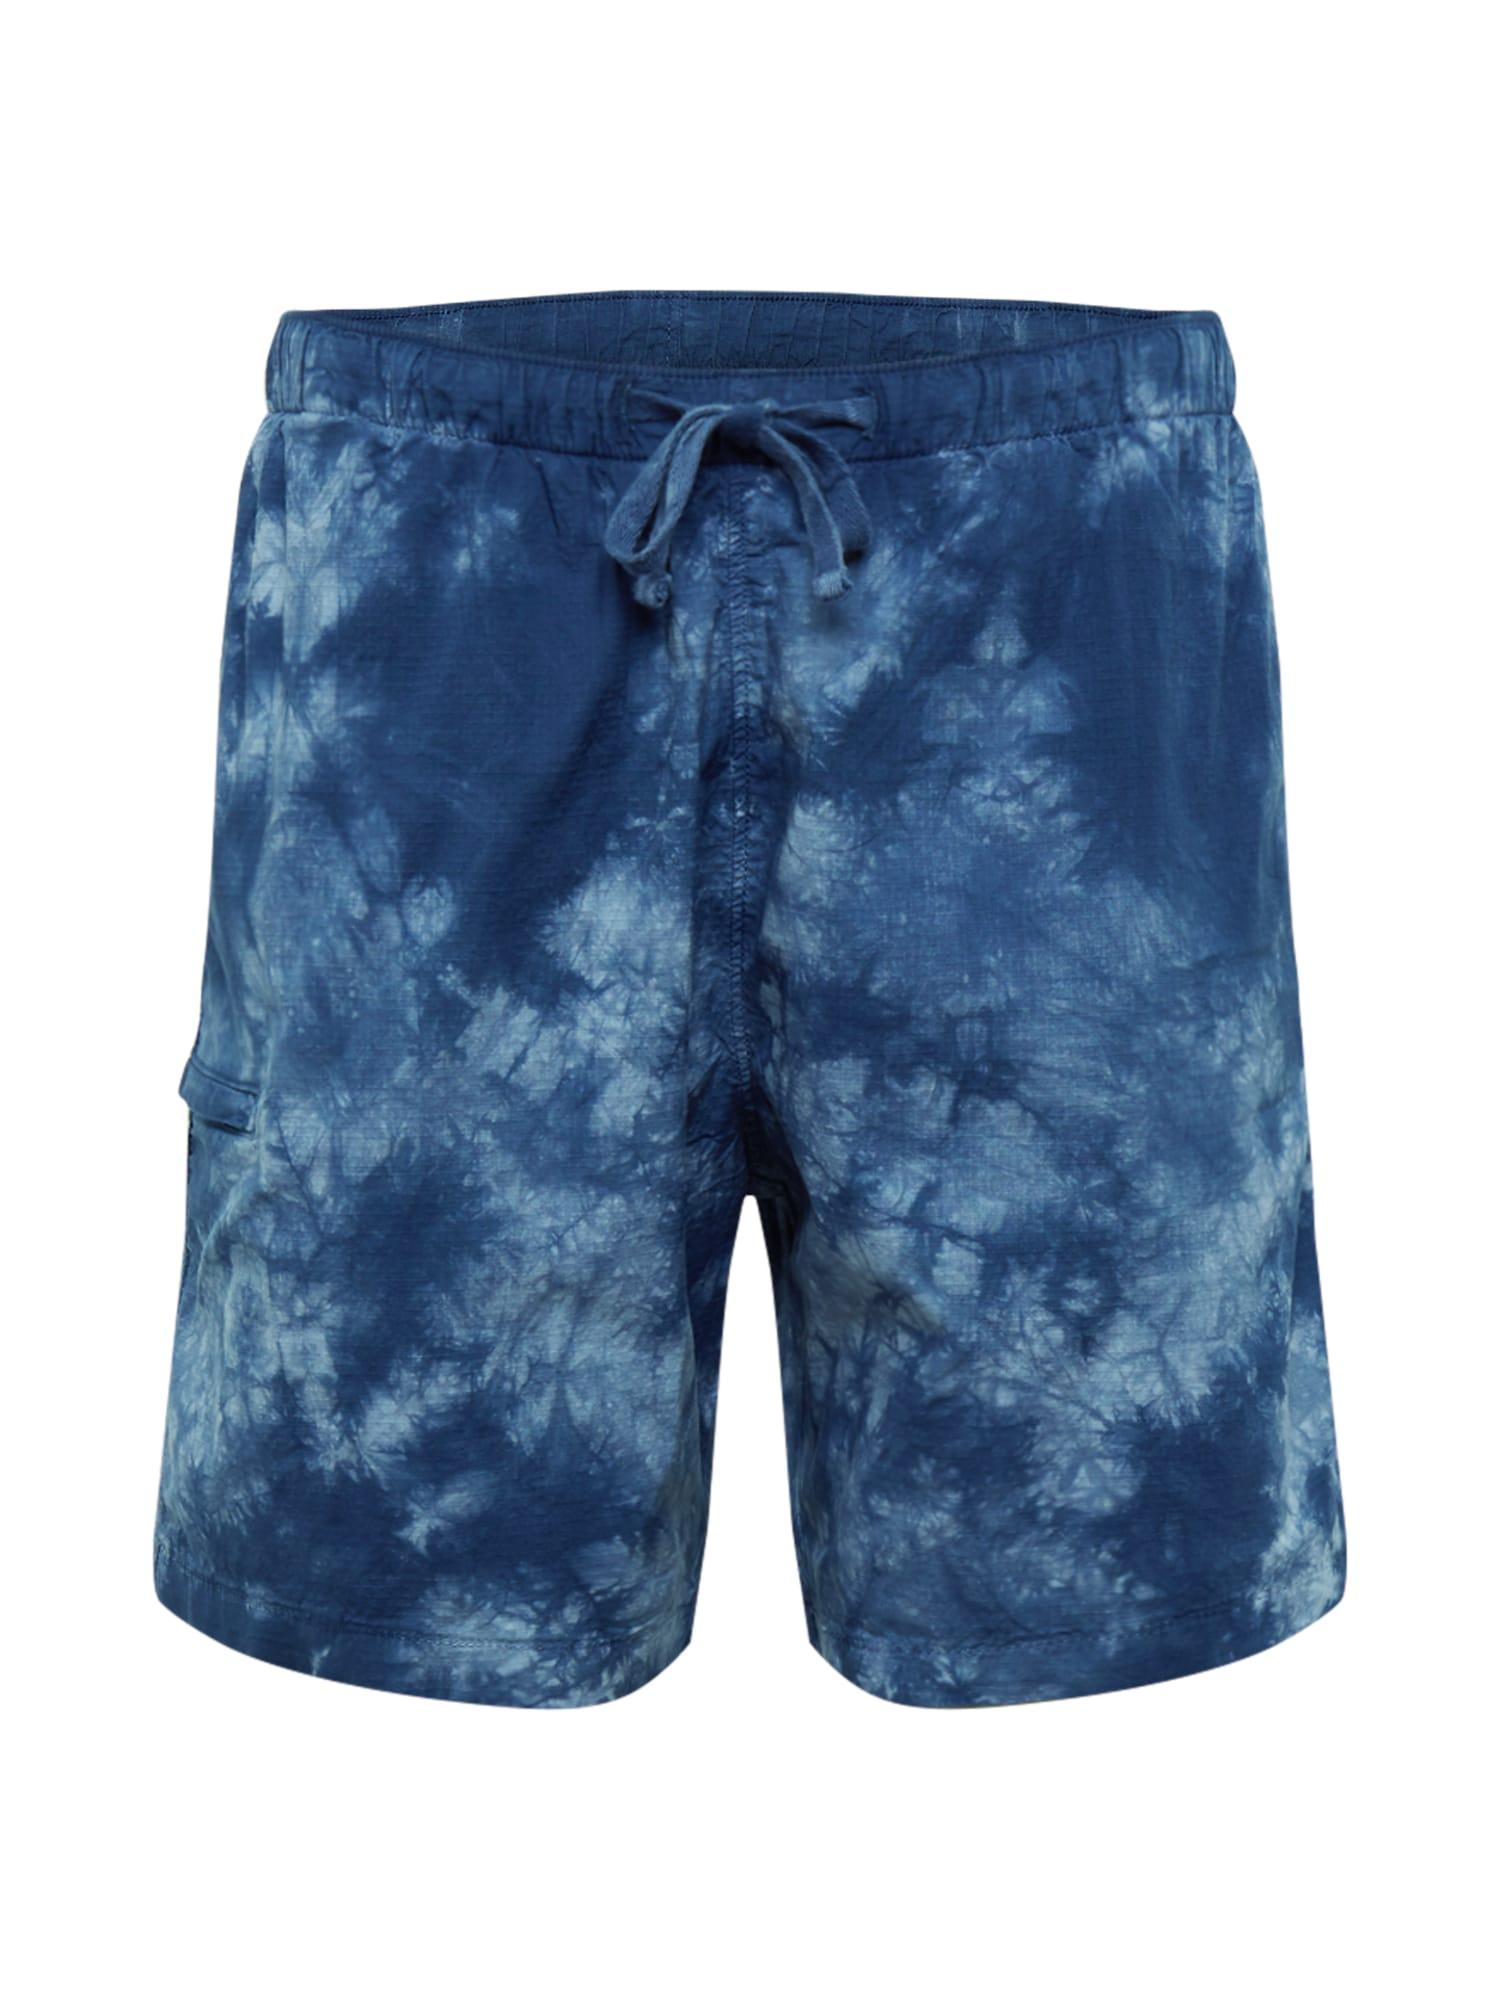 LEVI'S Nohavice 'WALK'  dymovo modrá / modrosivá